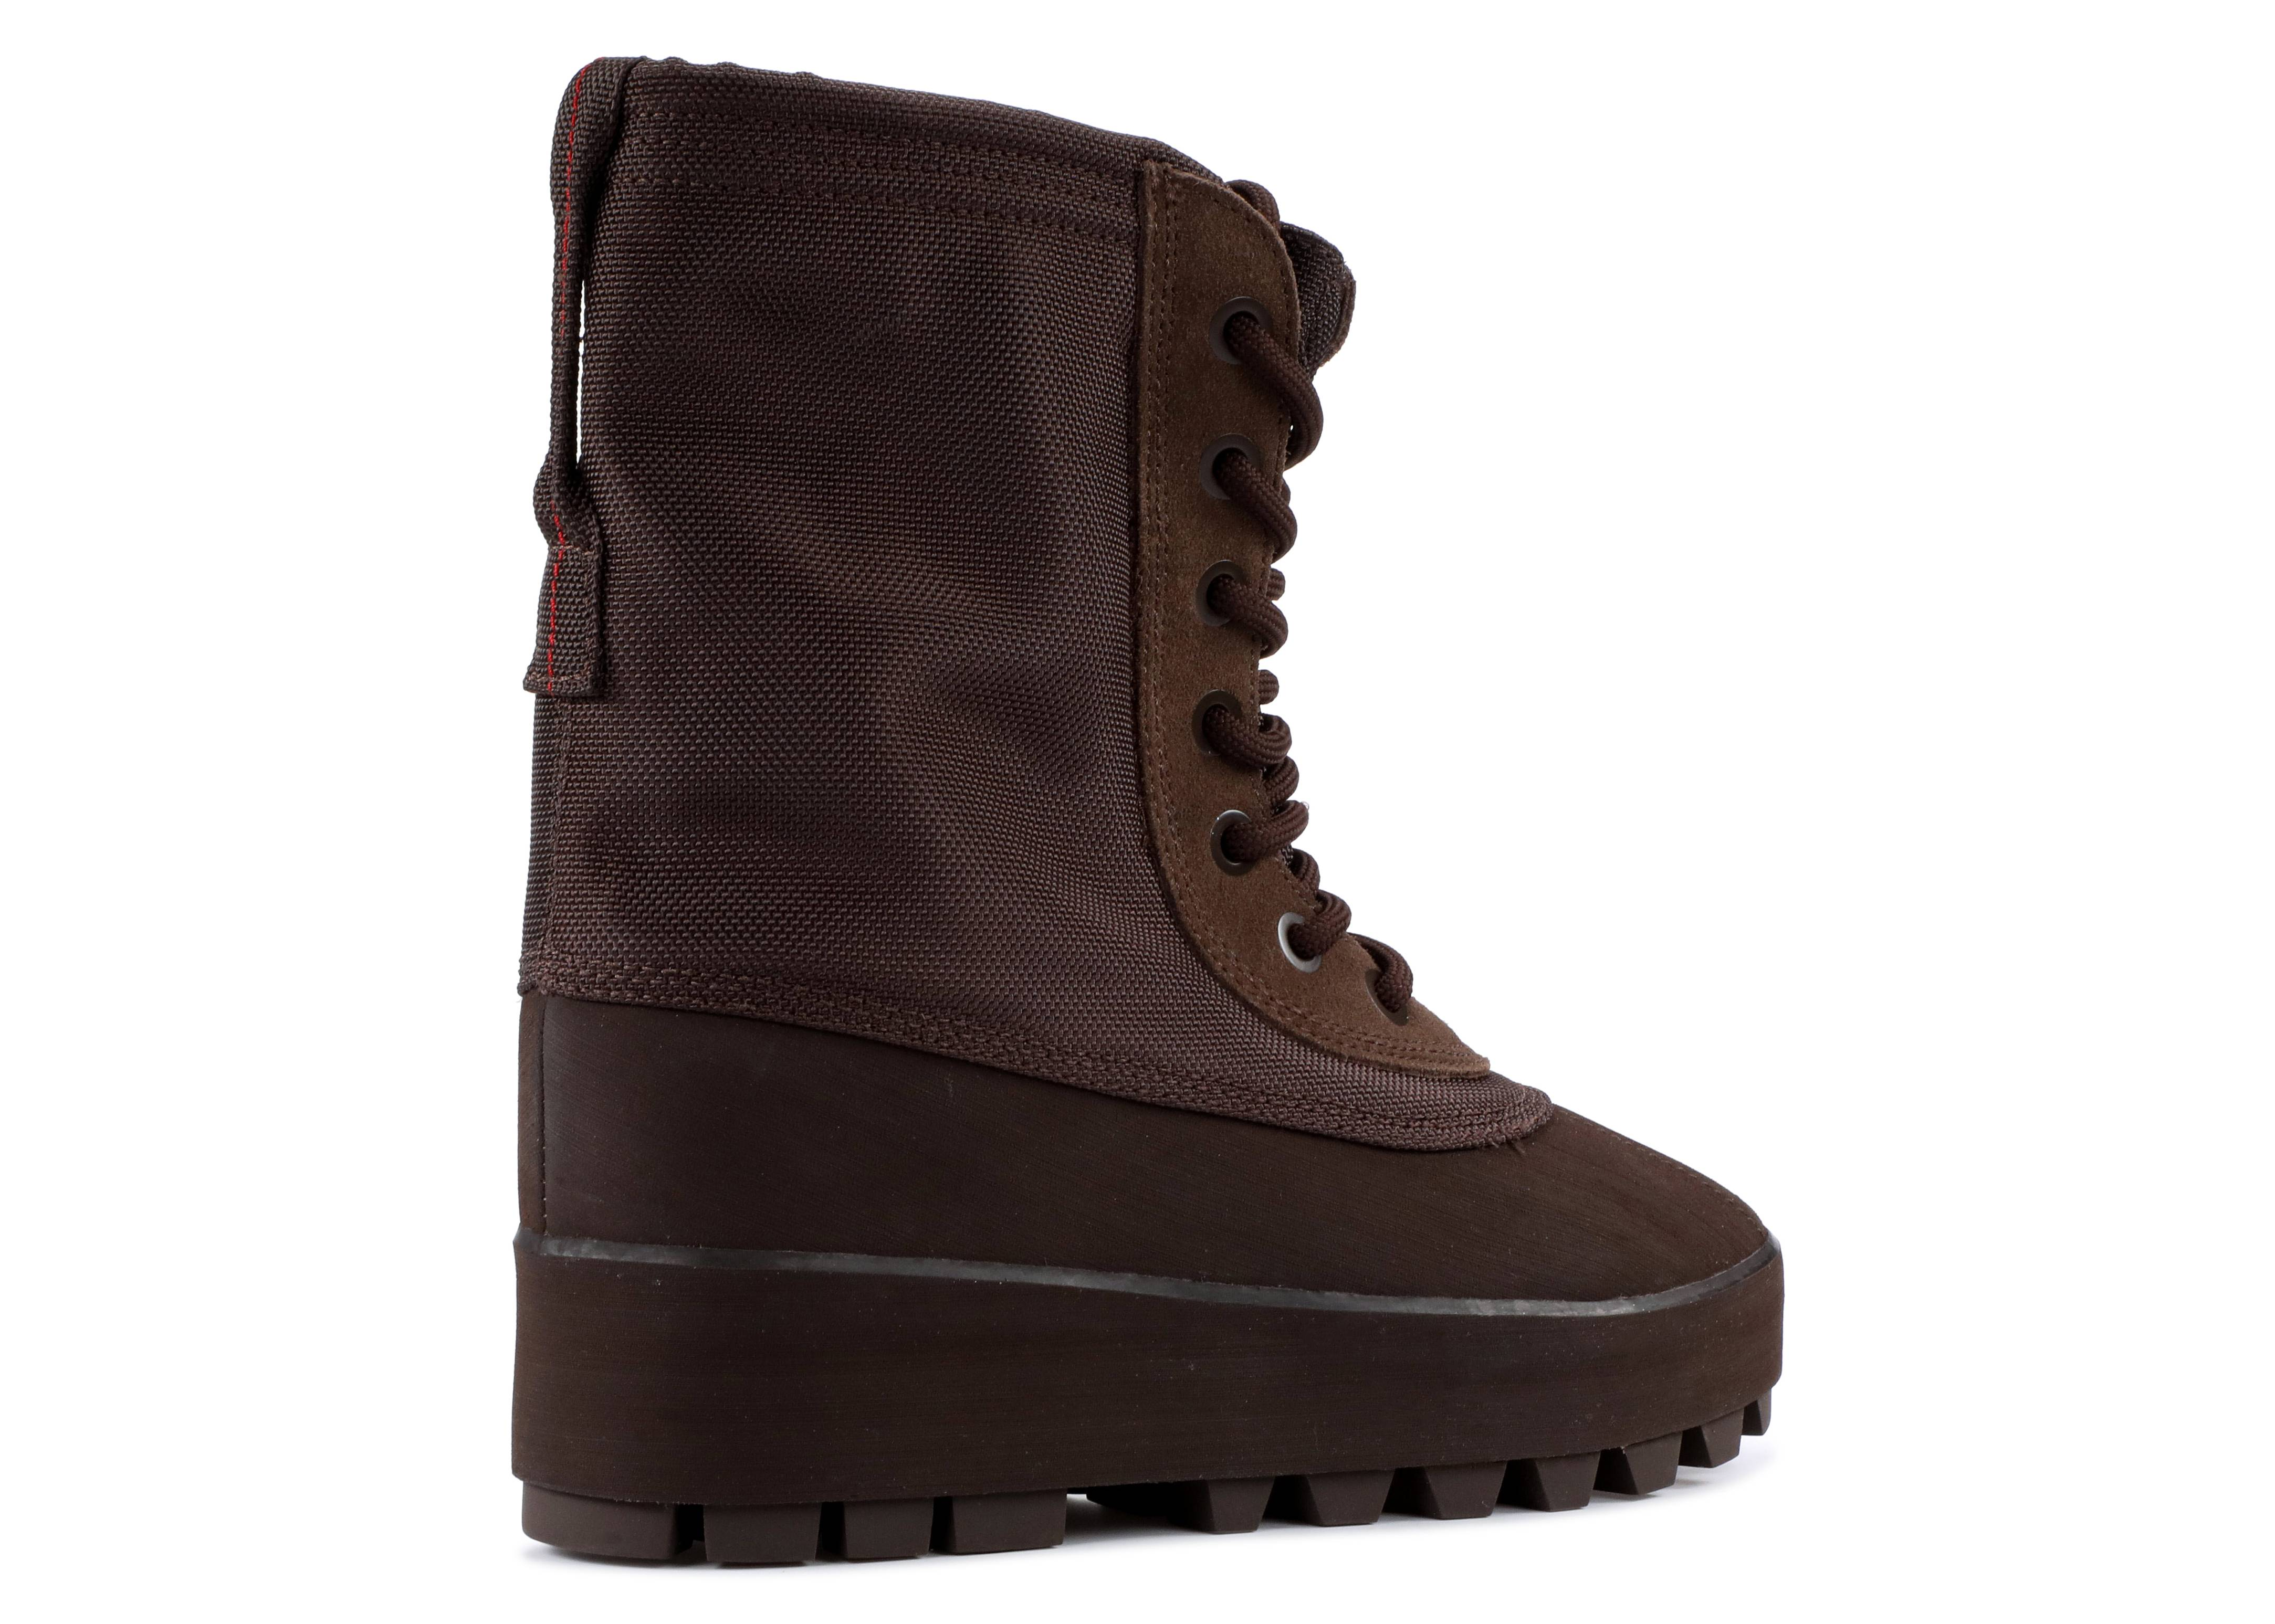 b6f15a2e8b578 adidas. yeezy 950 m